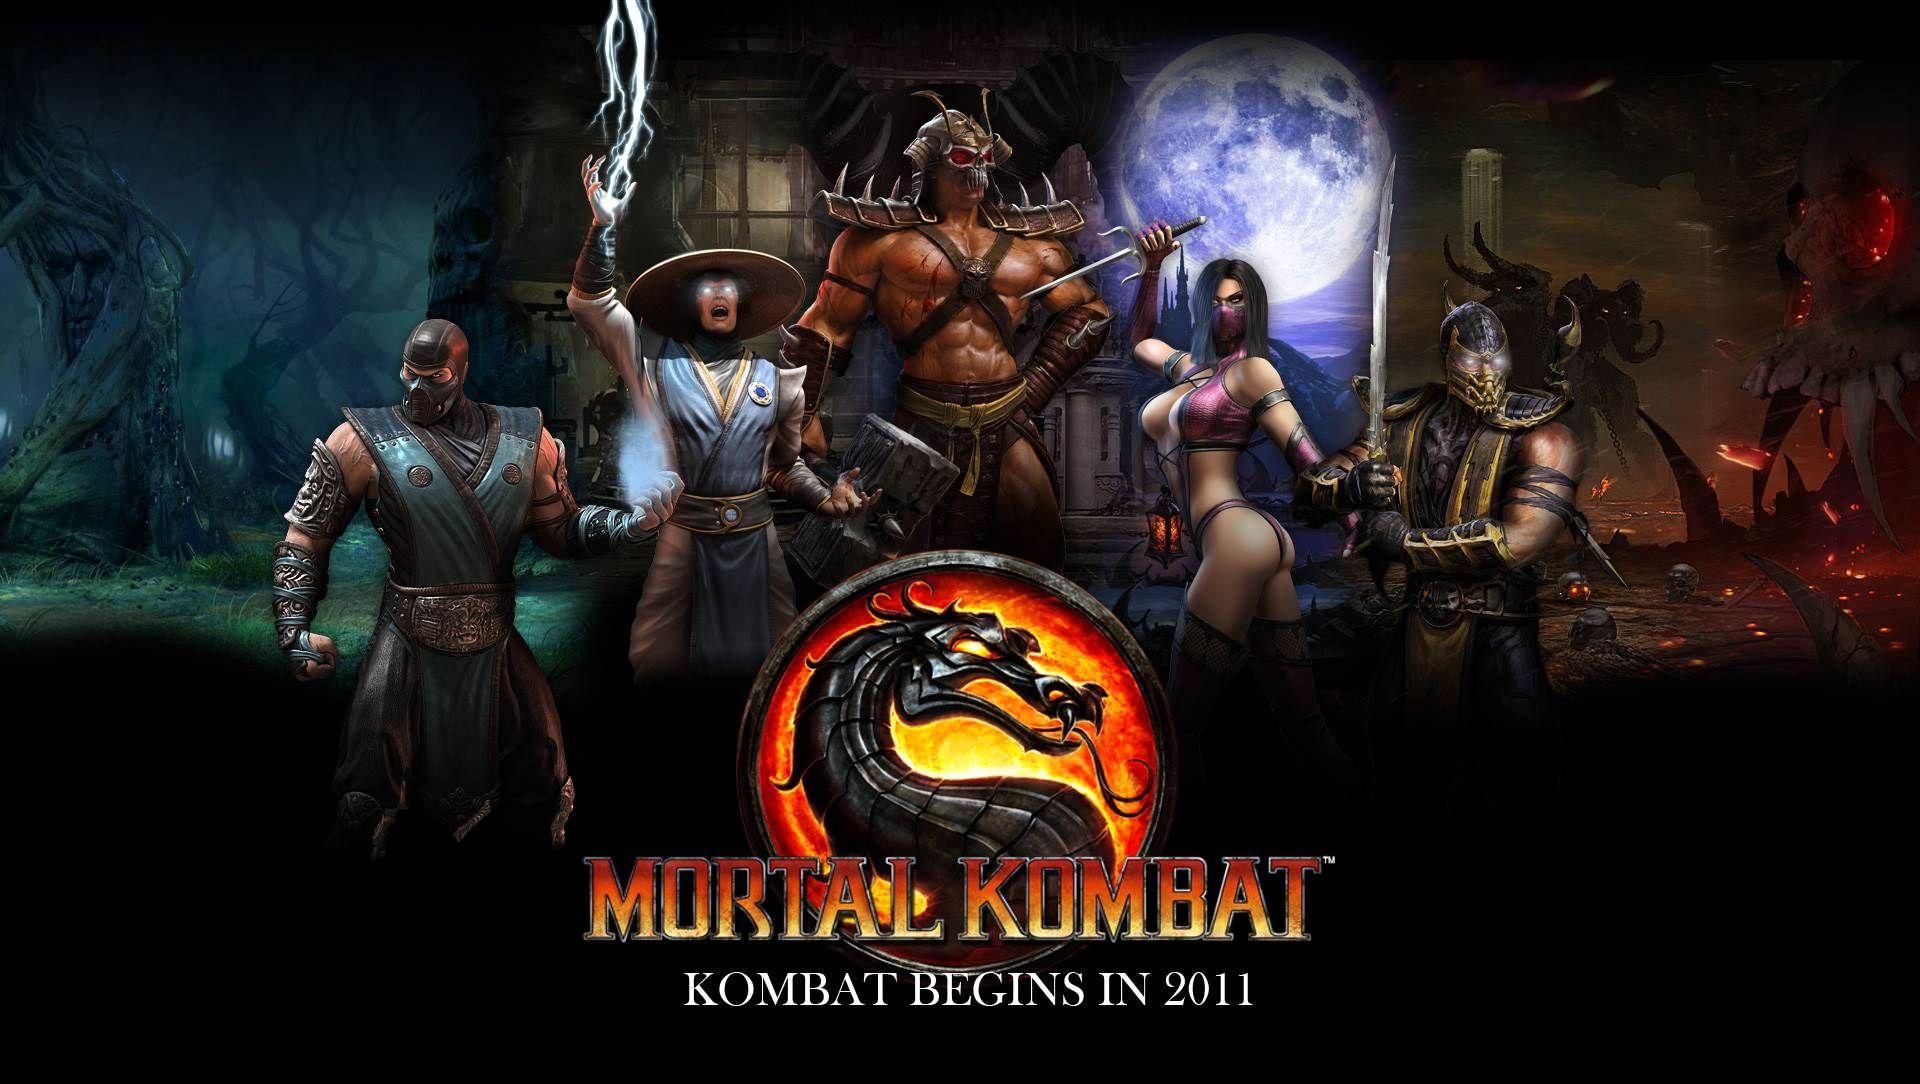 Mortal Kombat Sub Zero And Kitana Wallpaper 1920x1080 Imagenes De 9